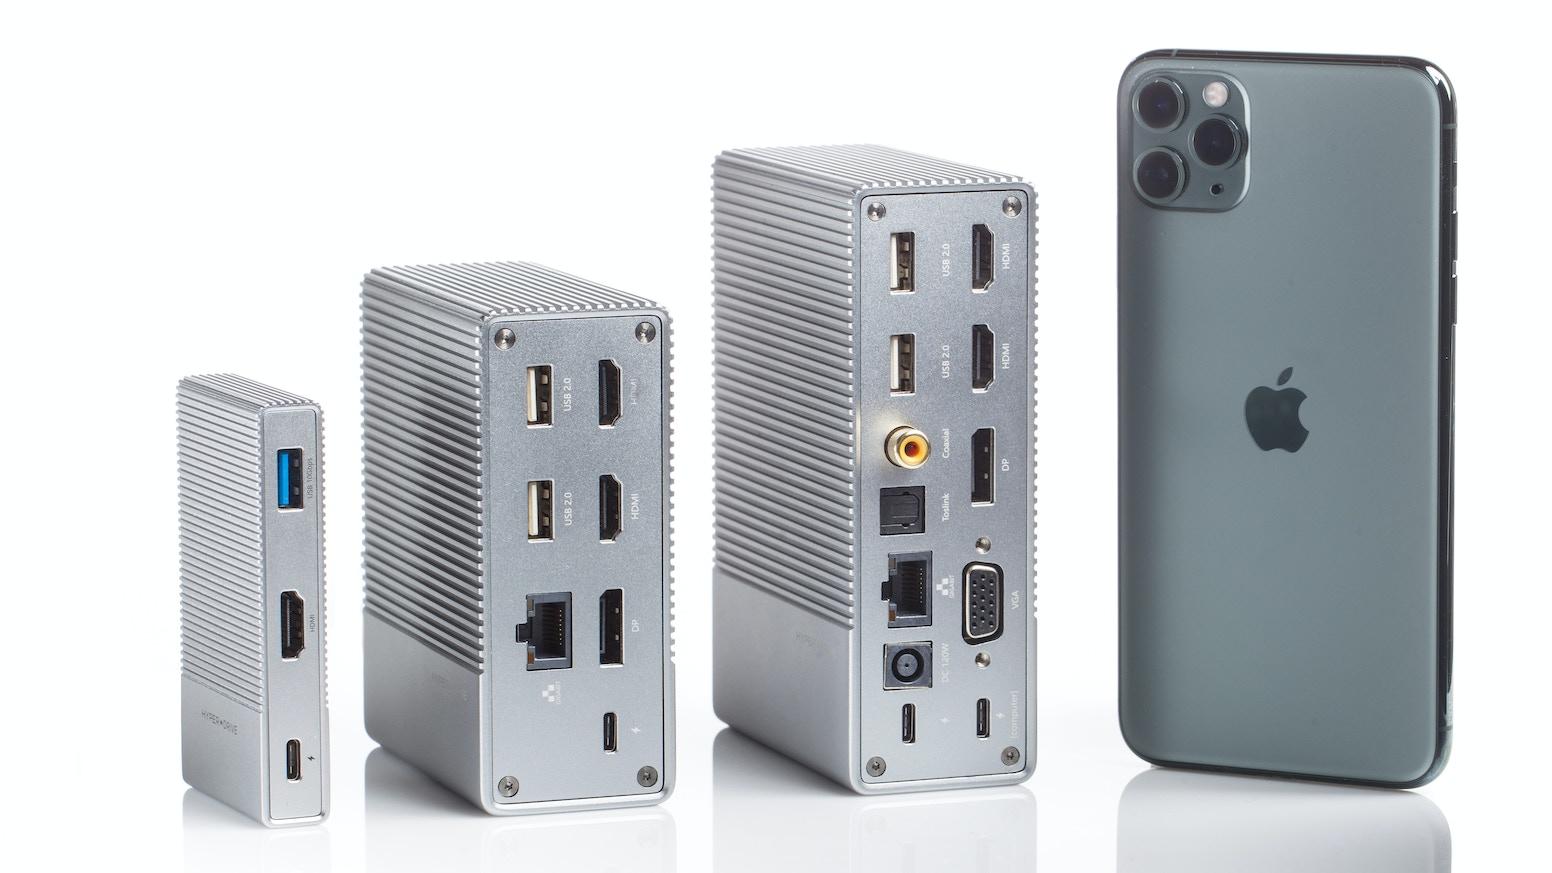 4K60Hz Video + 10Gbps USB 3.1 Gen 2 + 300MB/s UHS-II MicroSD/SD + 100W USB-C Power Delivery